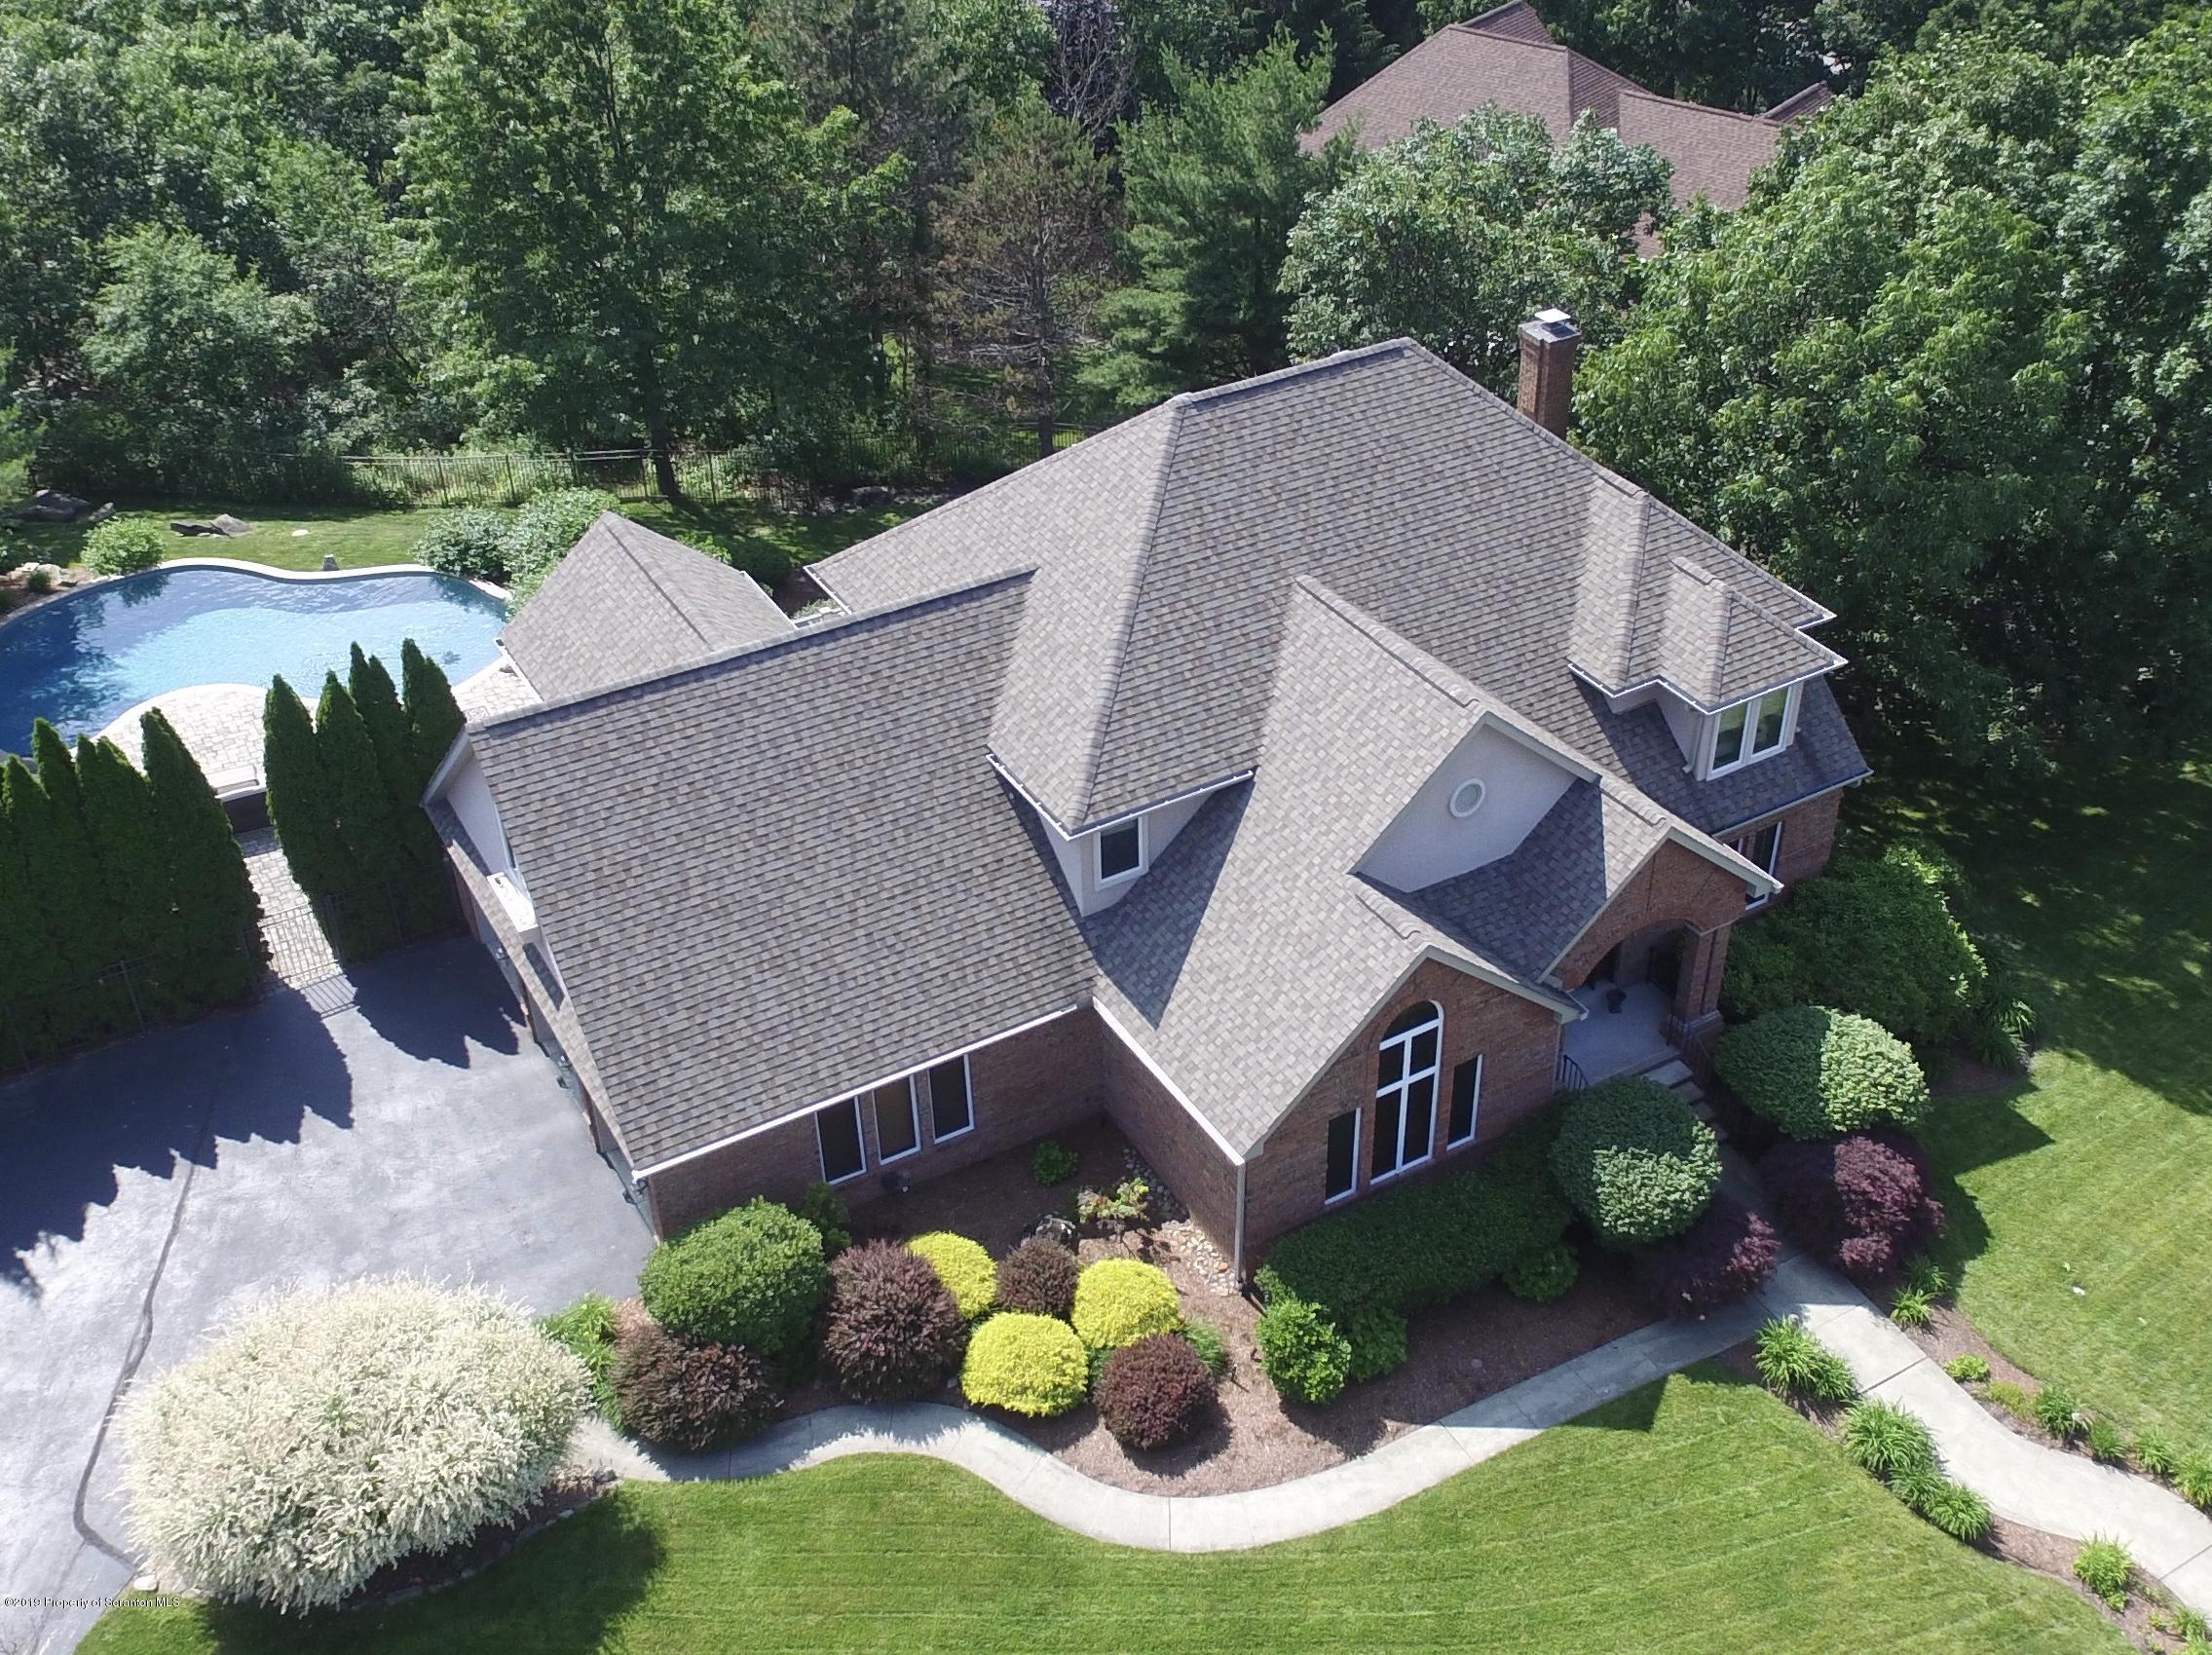 206 Salinger Close, Moosic, Pennsylvania 18507, 4 Bedrooms Bedrooms, 12 Rooms Rooms,5 BathroomsBathrooms,Single Family,For Sale,Salinger Close,19-2899